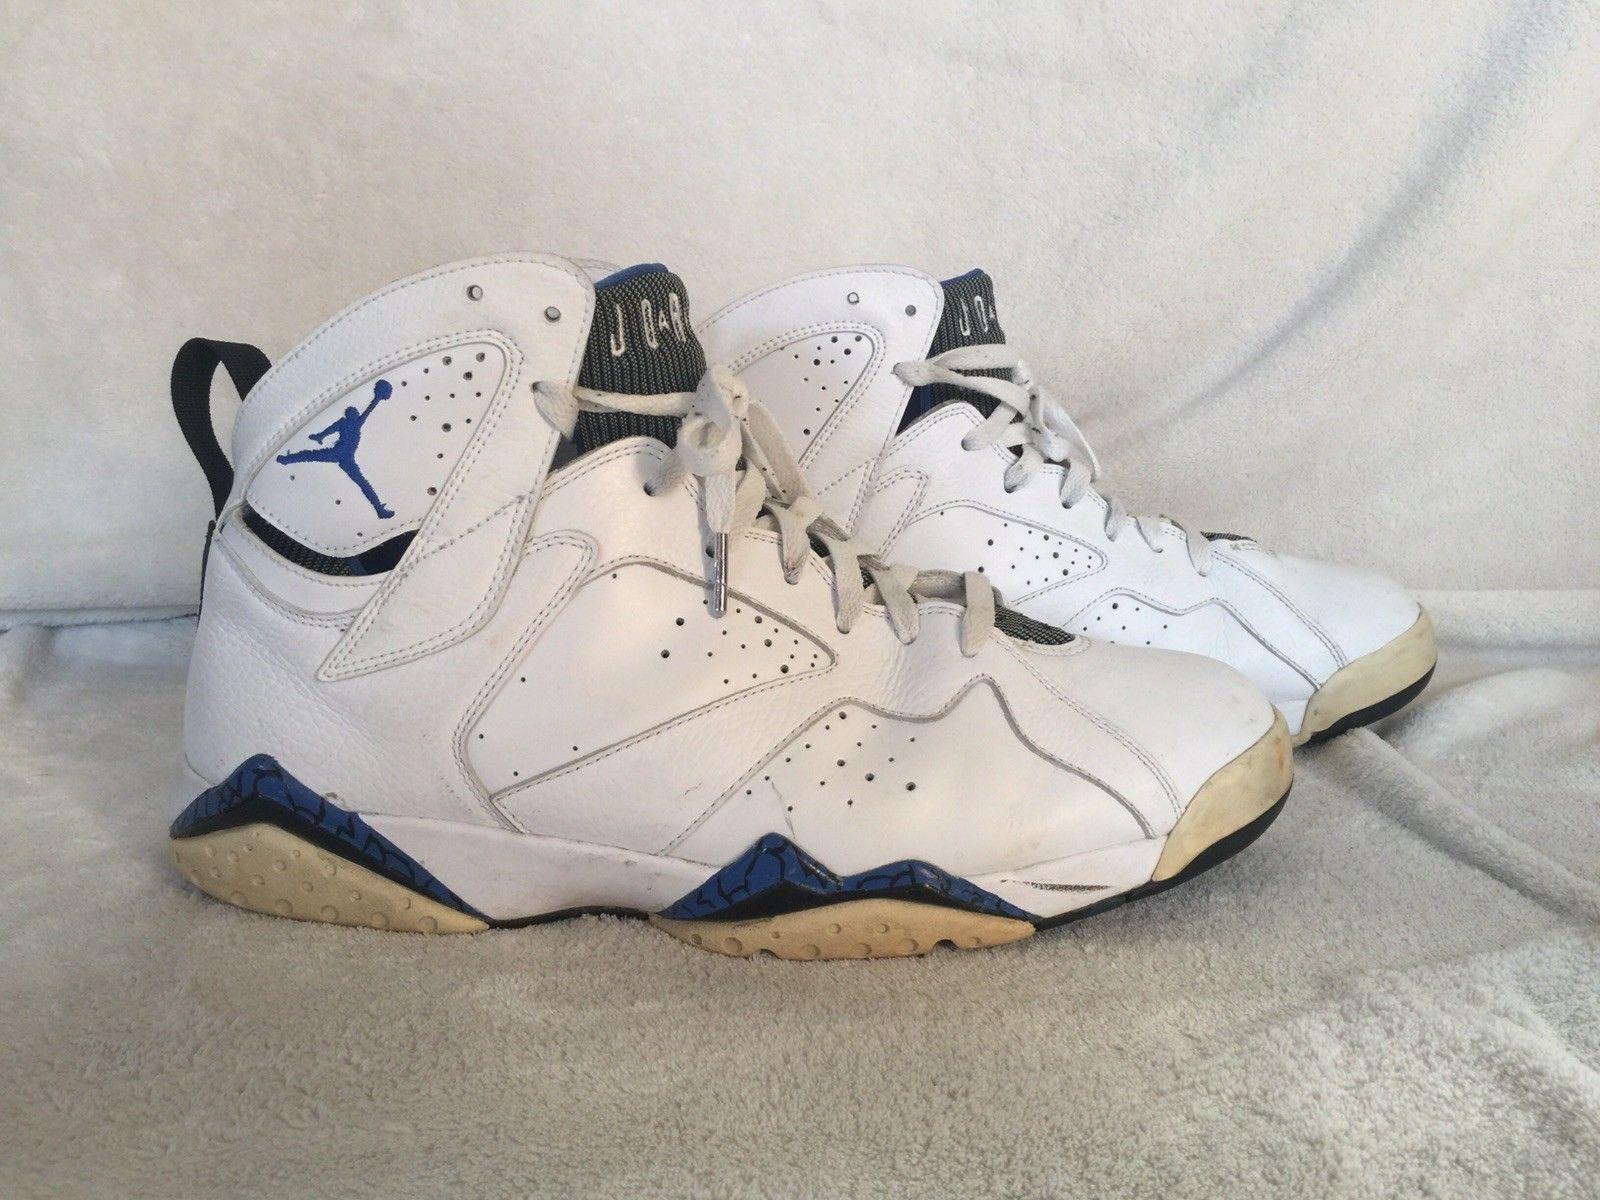 Air Jordan 7 Retro  Defining Moments  - Men's 11.5